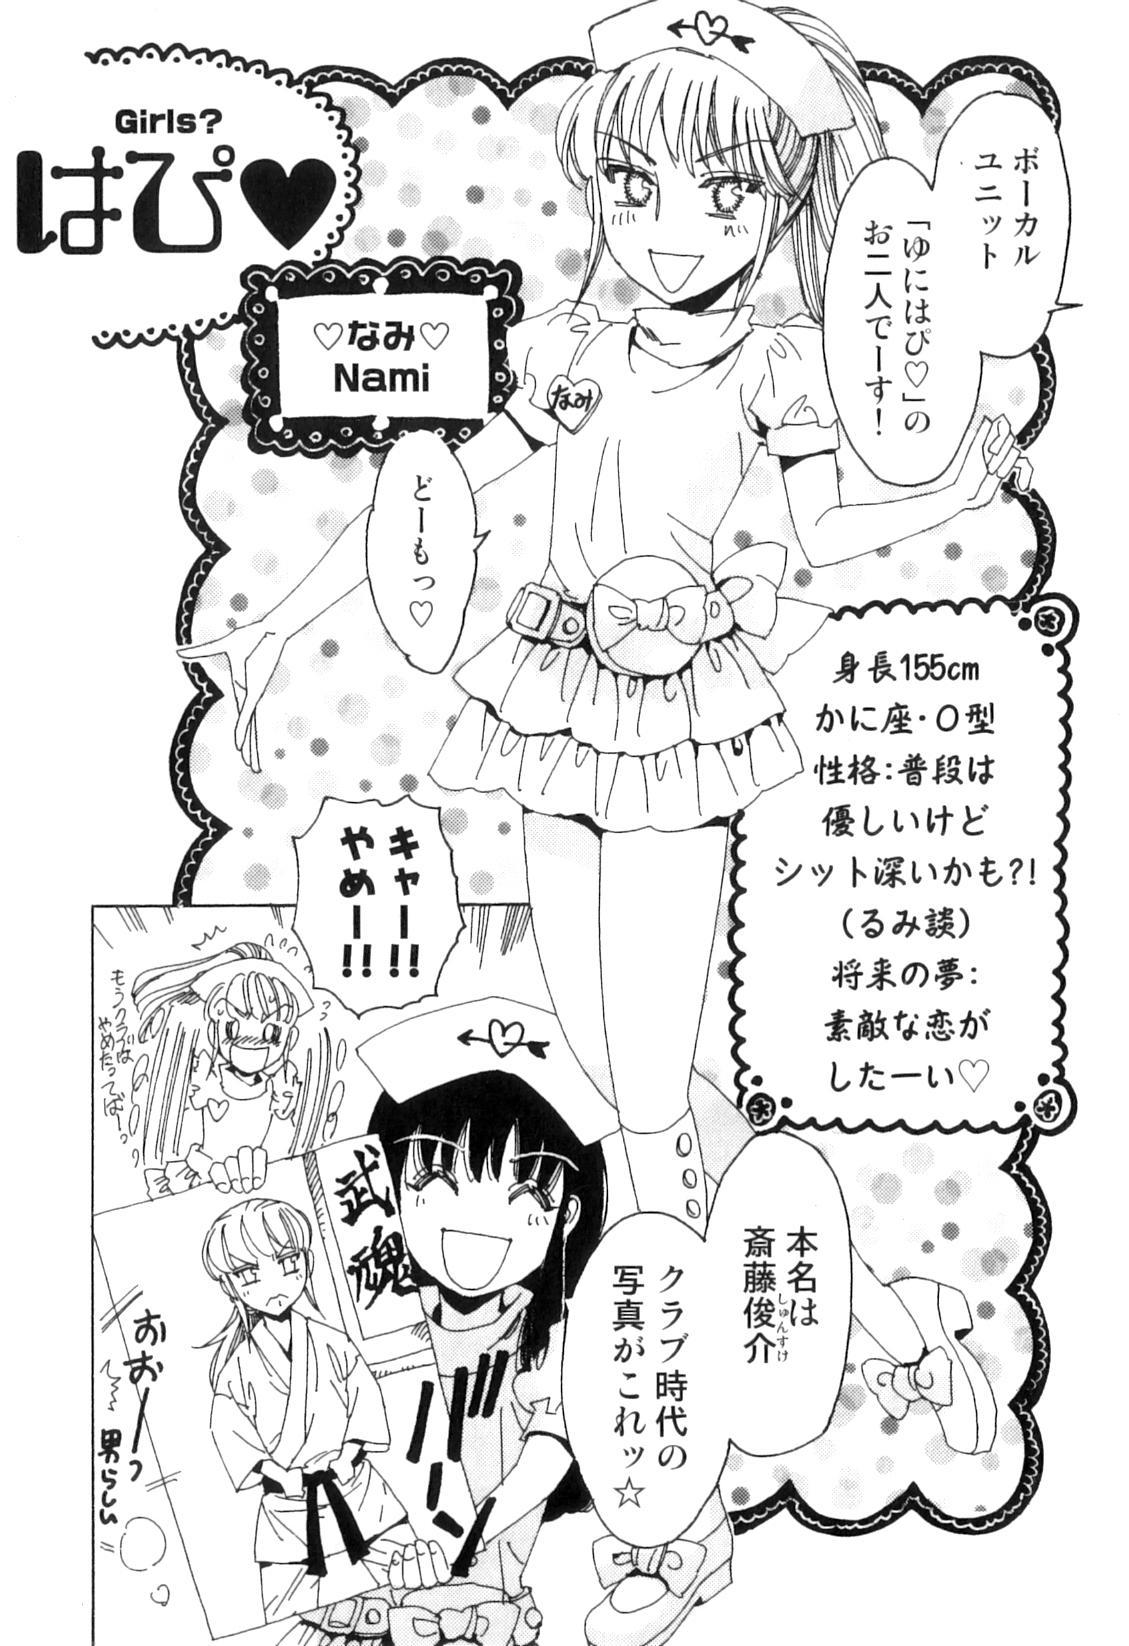 Yuni-Hapi 8